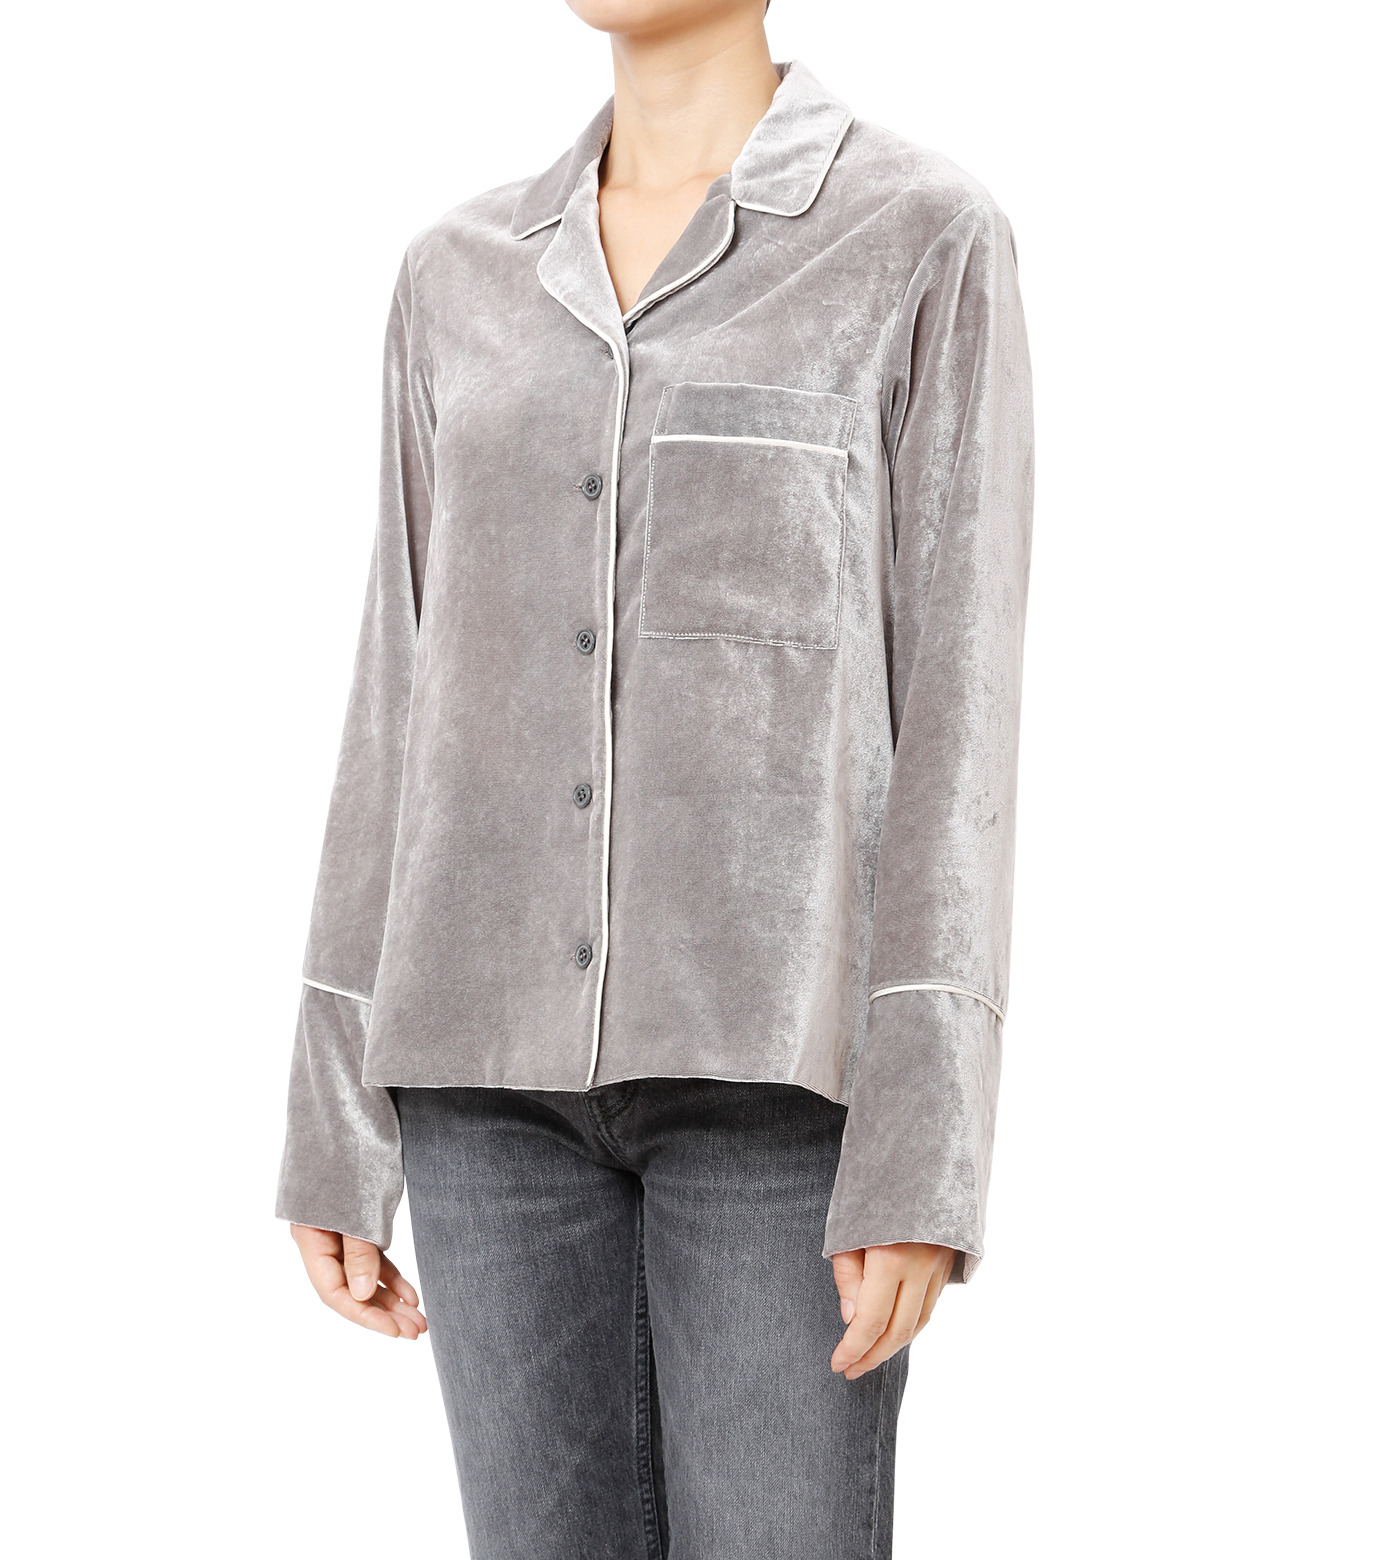 LE CIEL BLEU(ルシェルブルー)のルーズベルベットシャツ-GRAY(シャツ/shirt)-18A63417 拡大詳細画像1